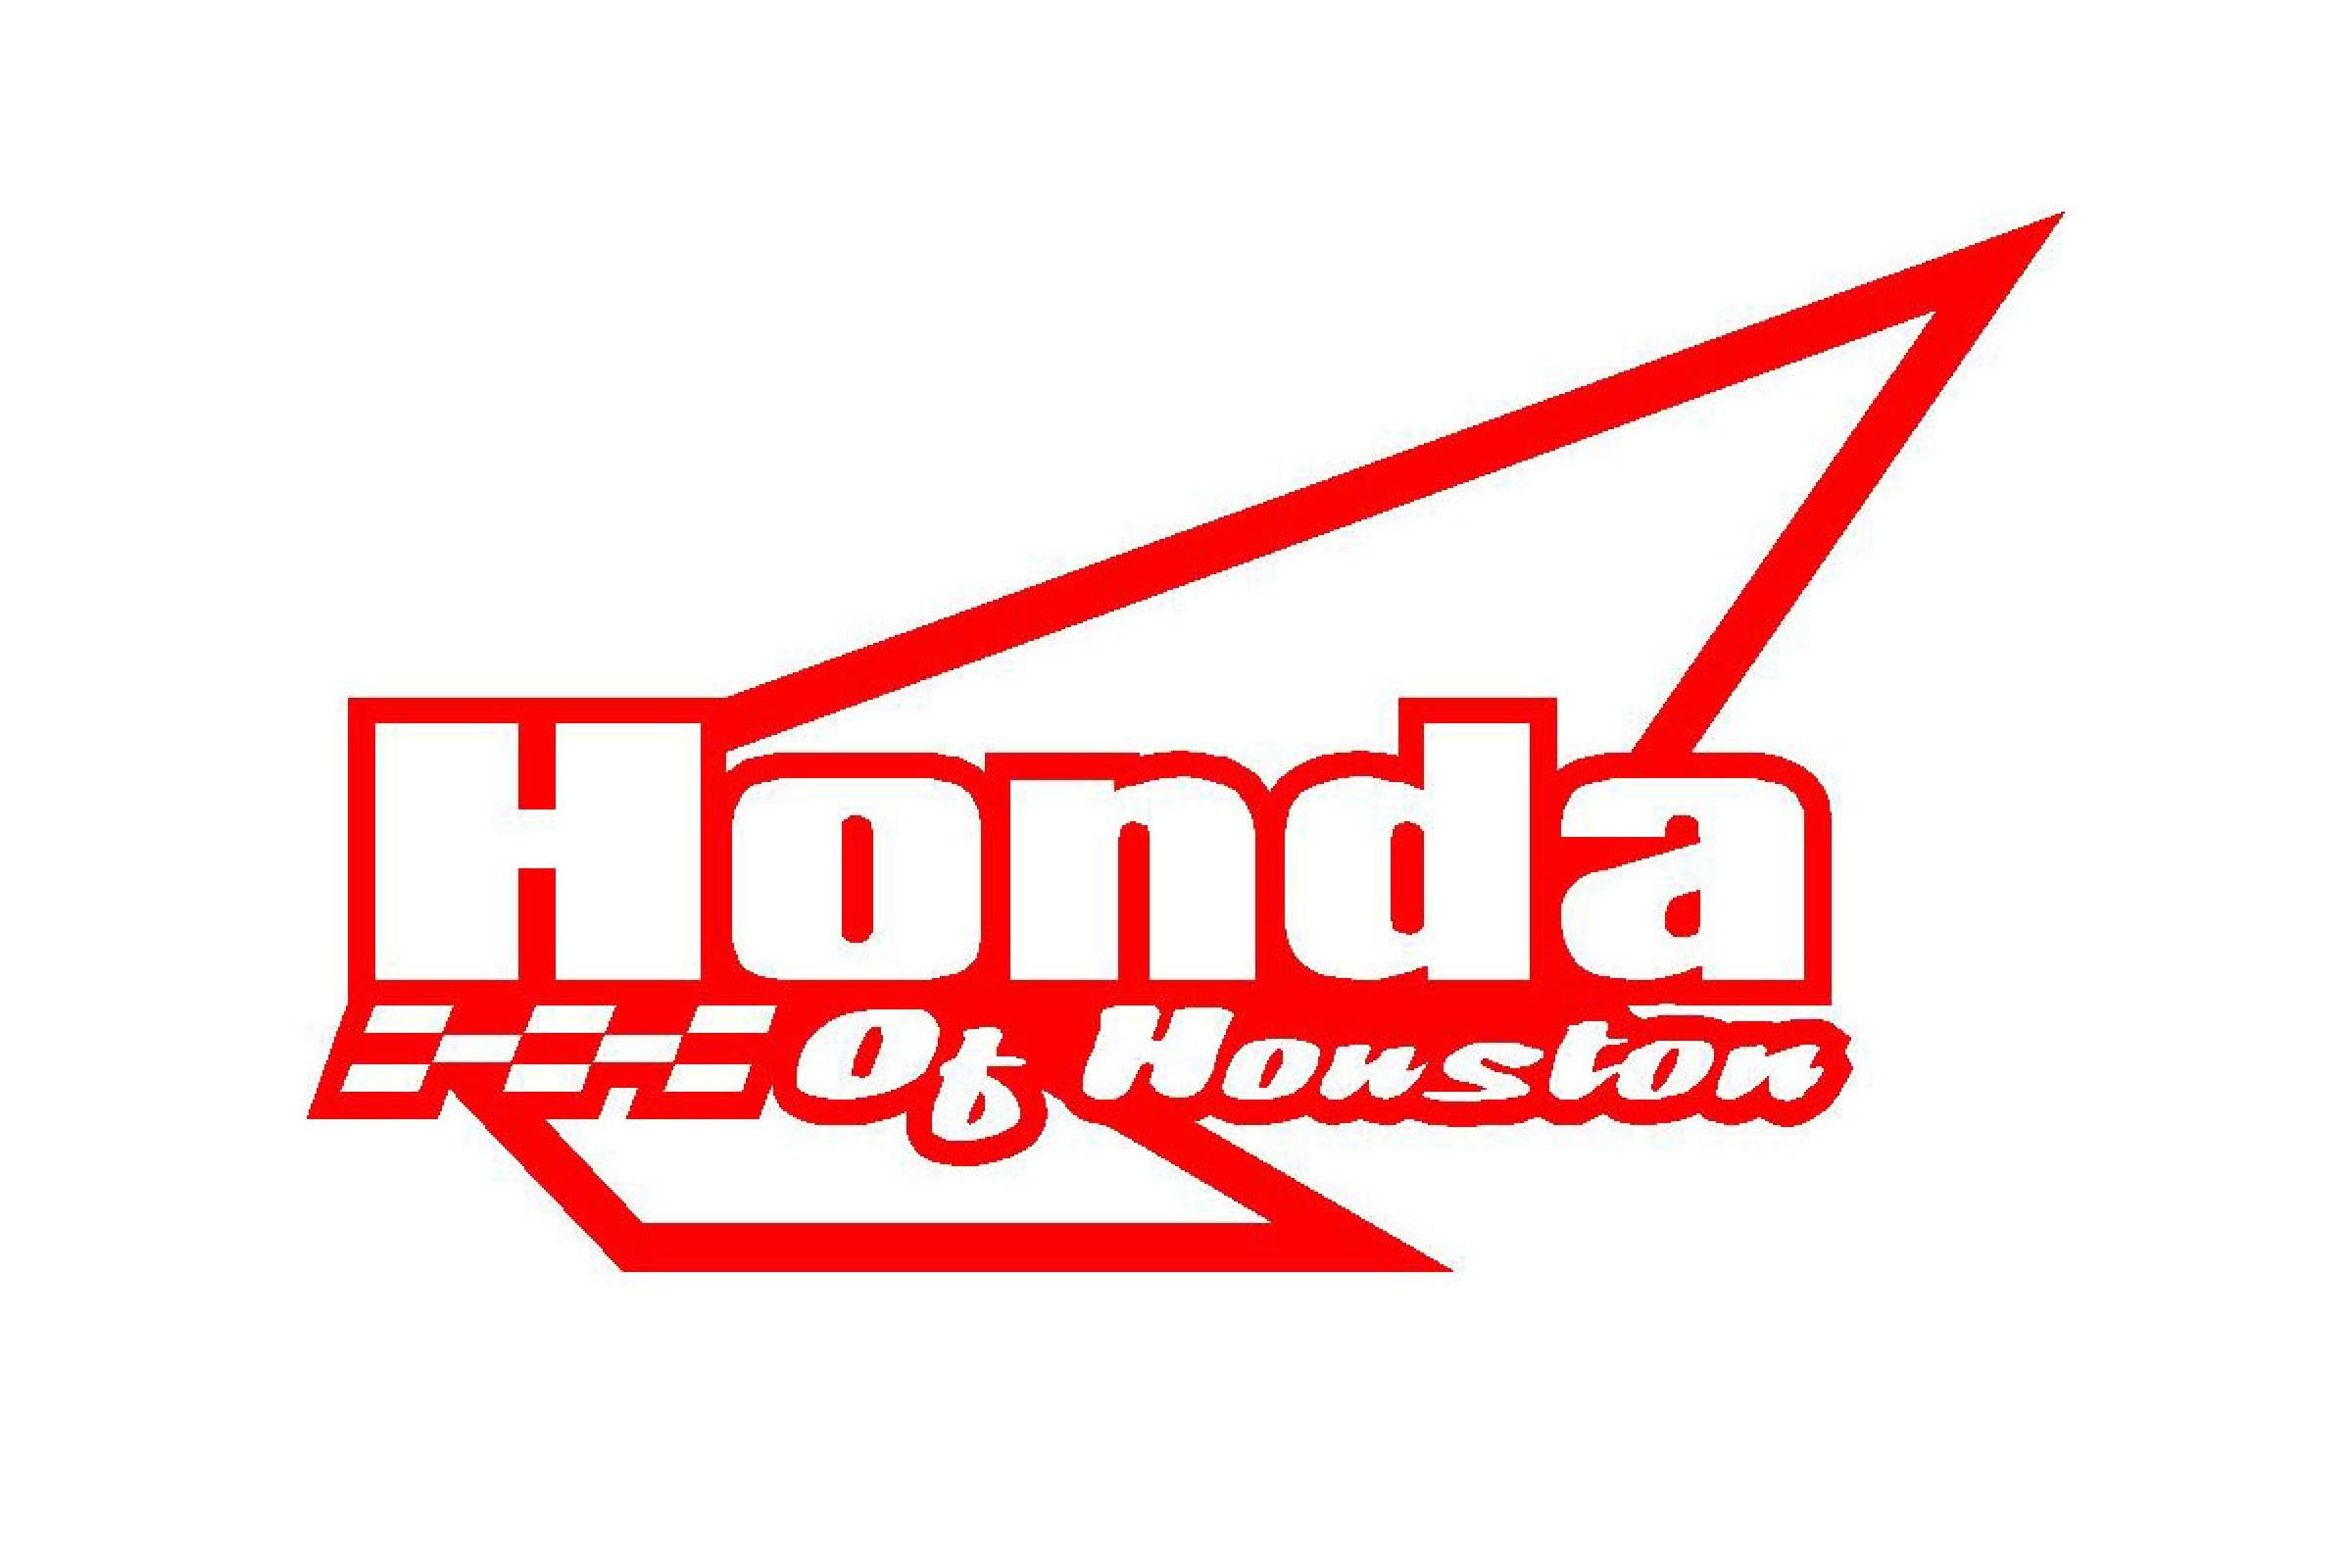 Honda Of Covington 2019 2020 New Car Release